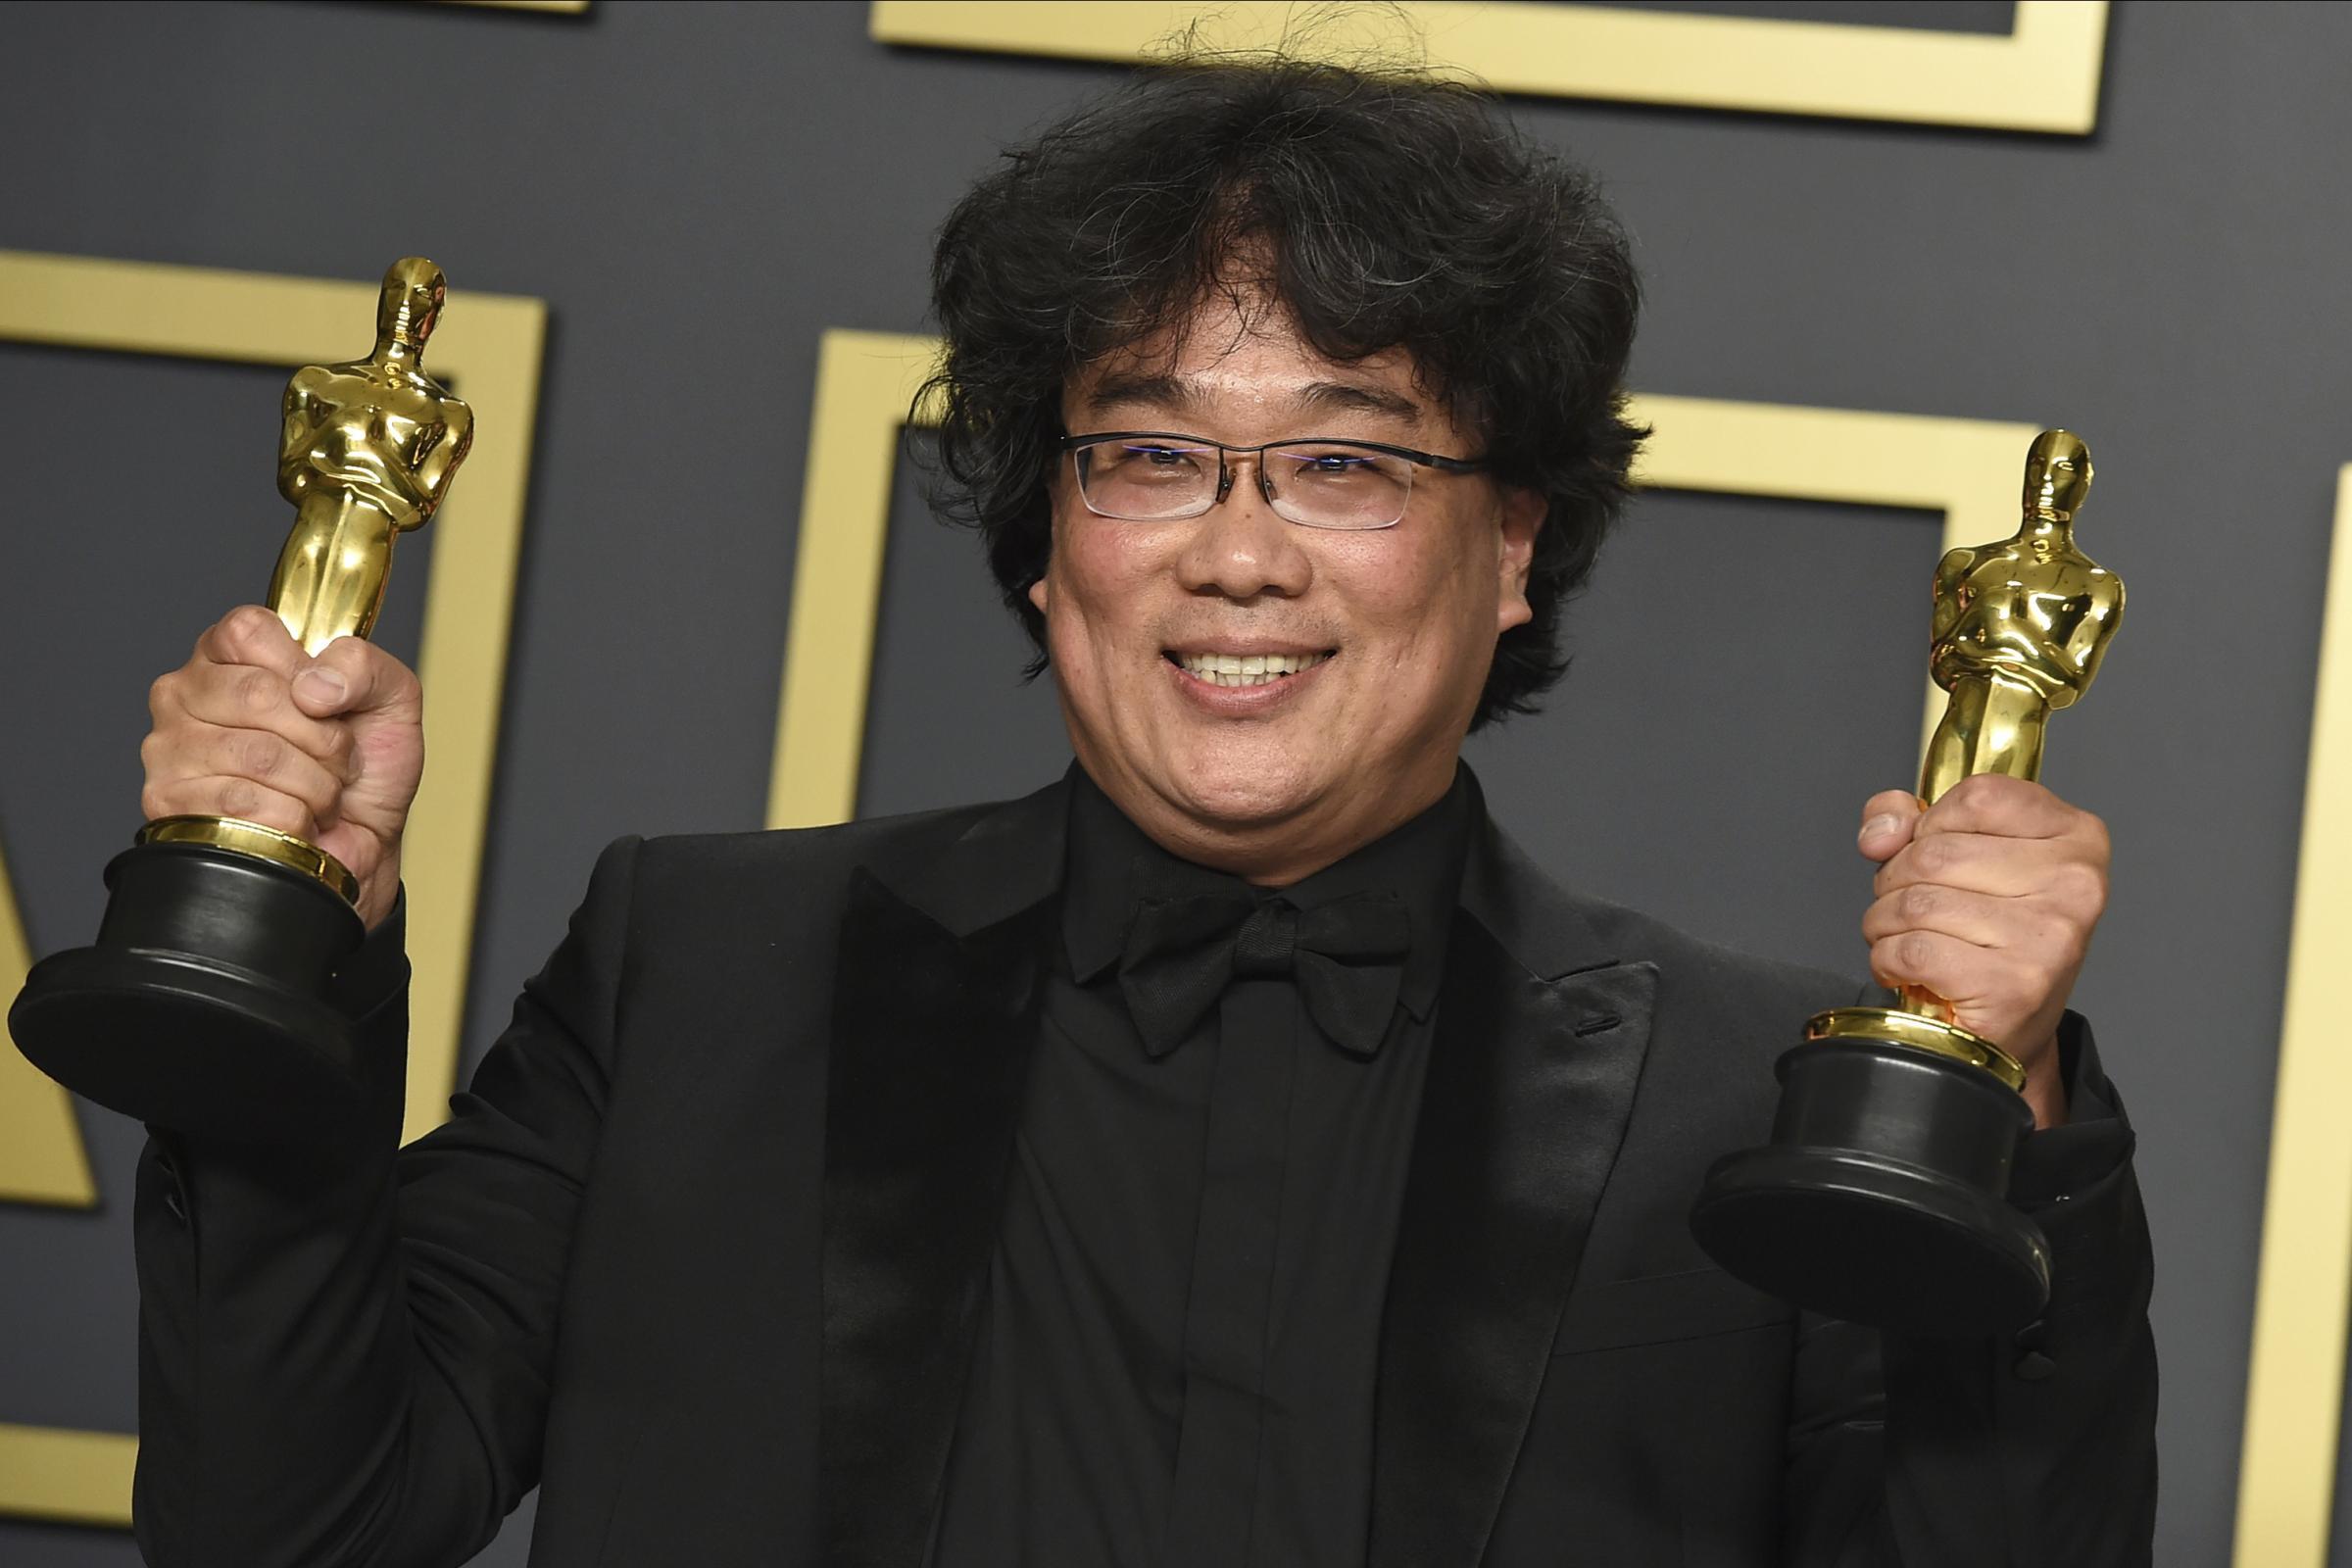 Il regista premio Oscar Bong Joon-ho presidente di giuria a Venezia